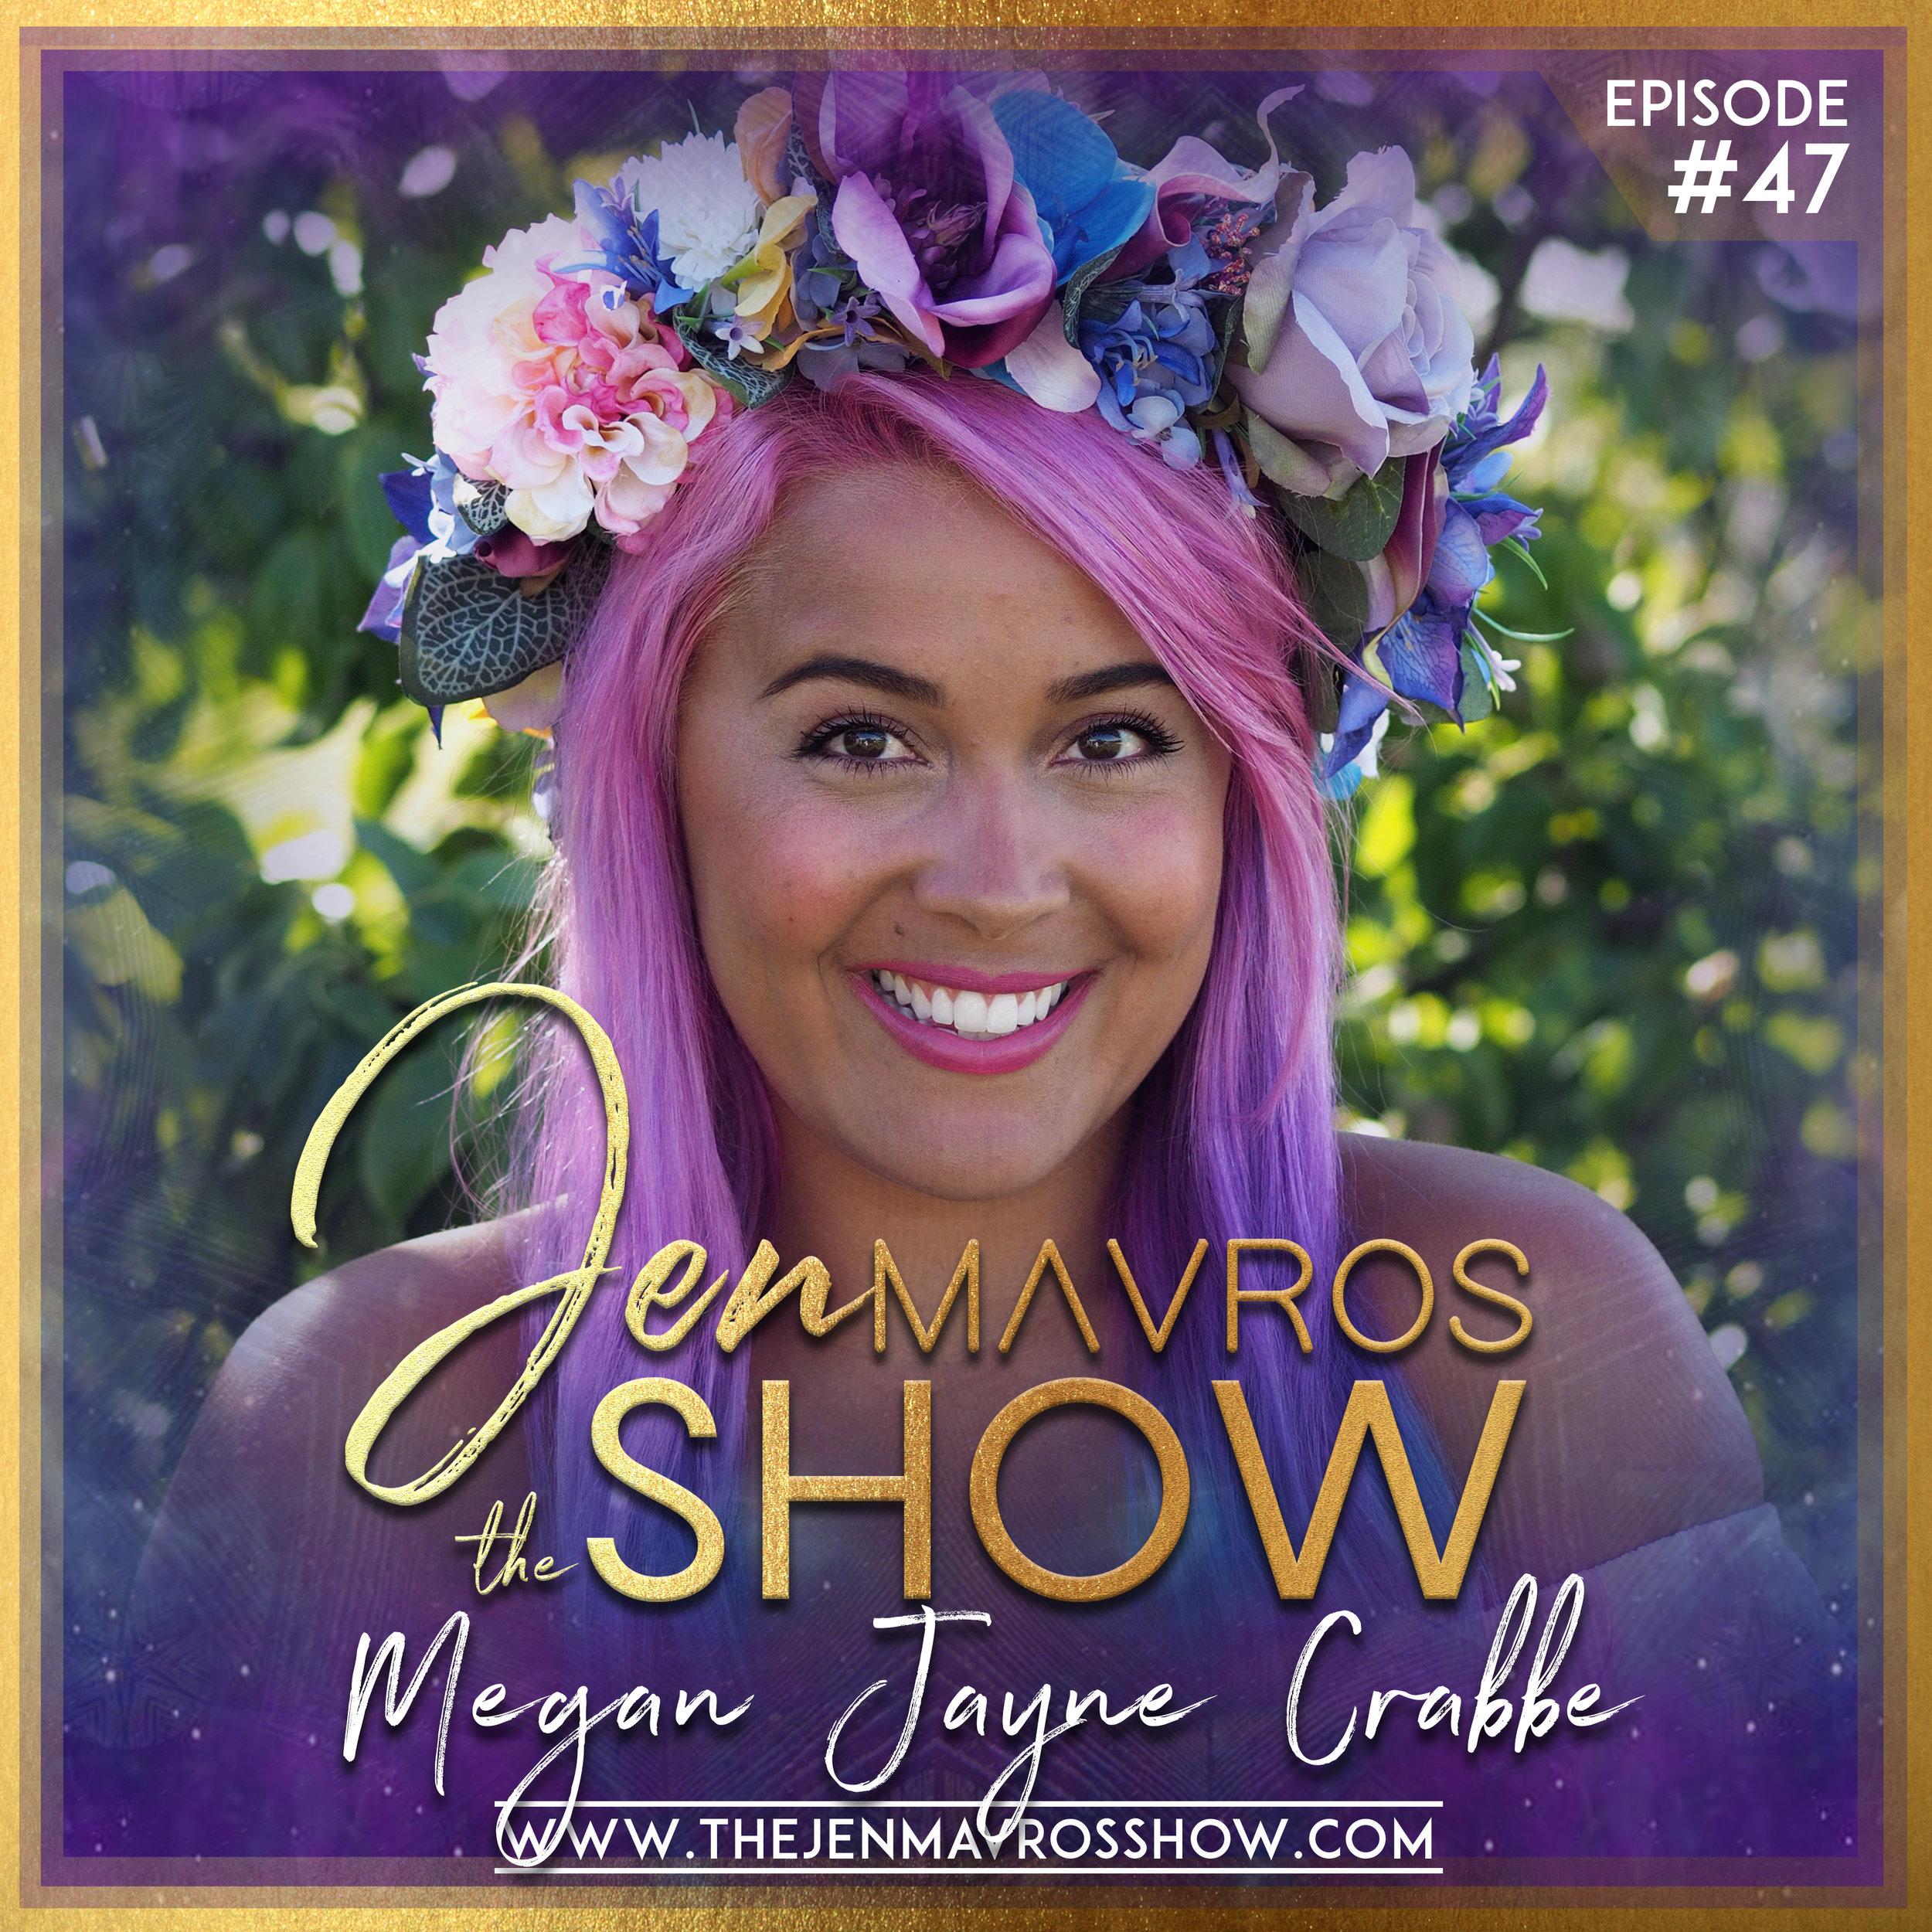 Megan Jayne Crabbe -@bodyposipanda - Body Positive Power - Making Peace With Your Body